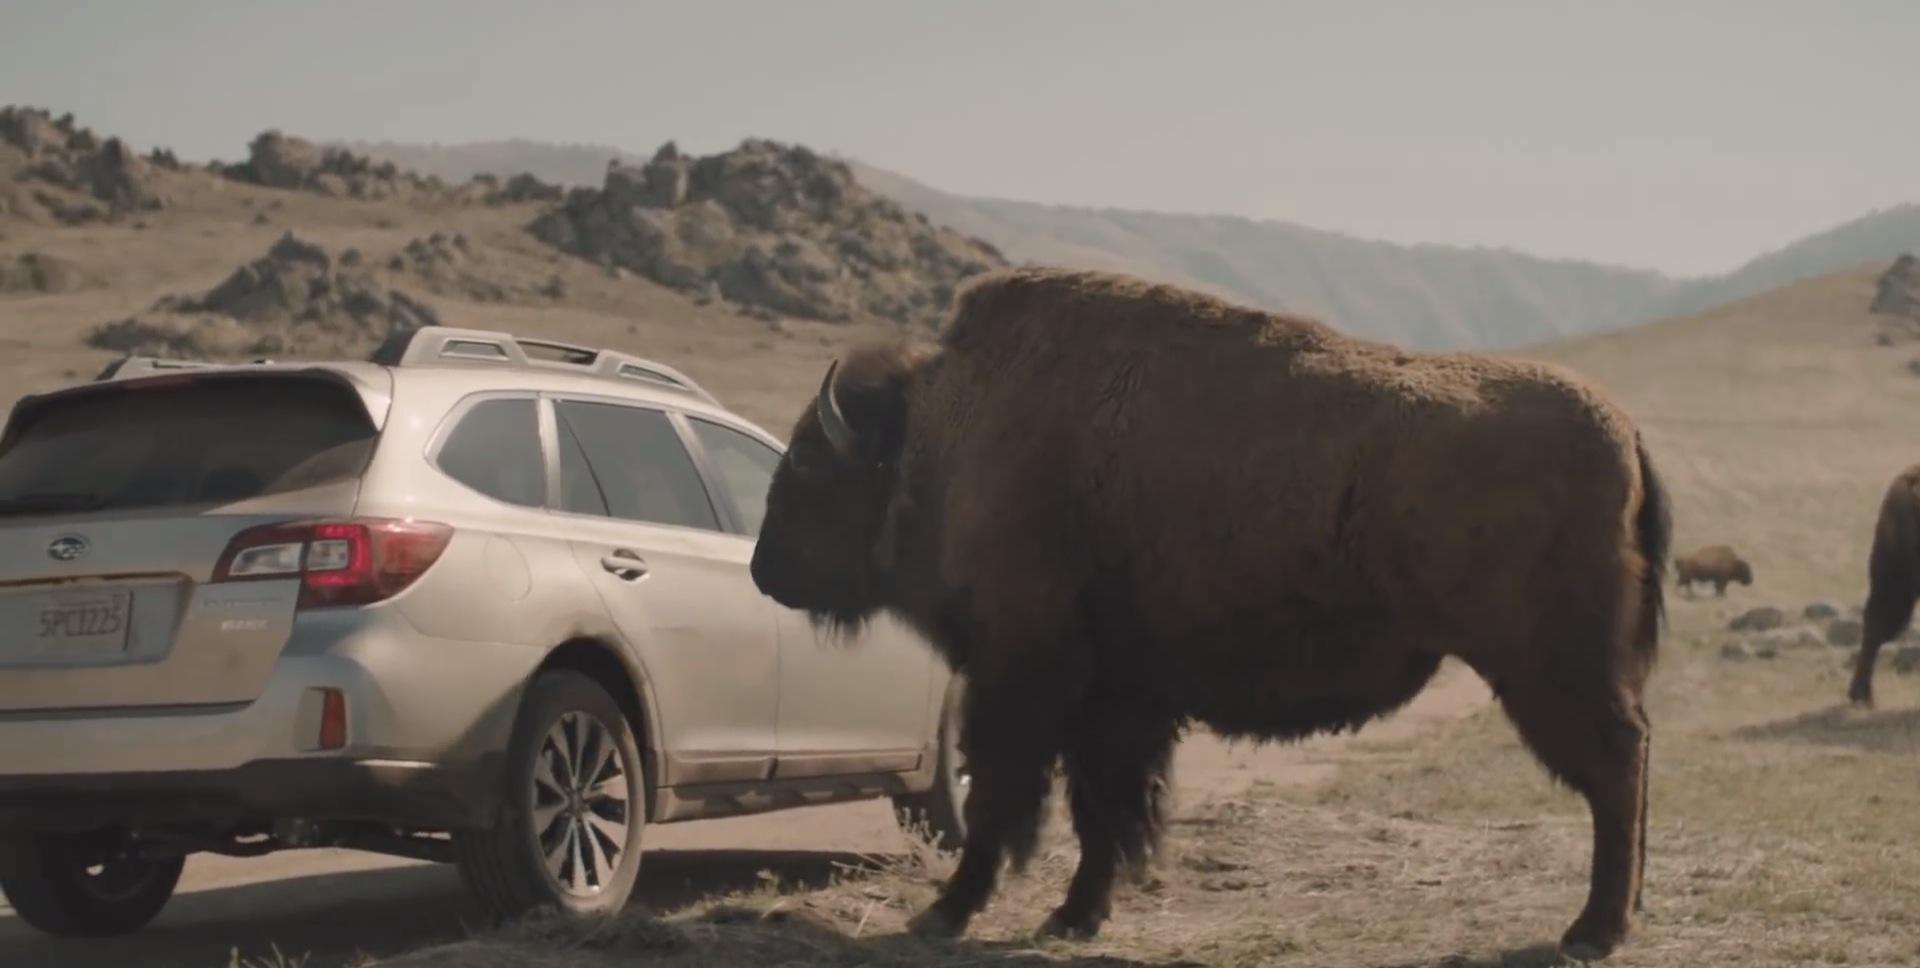 2015 Subaru Outback Commercial Bison Autoevolution